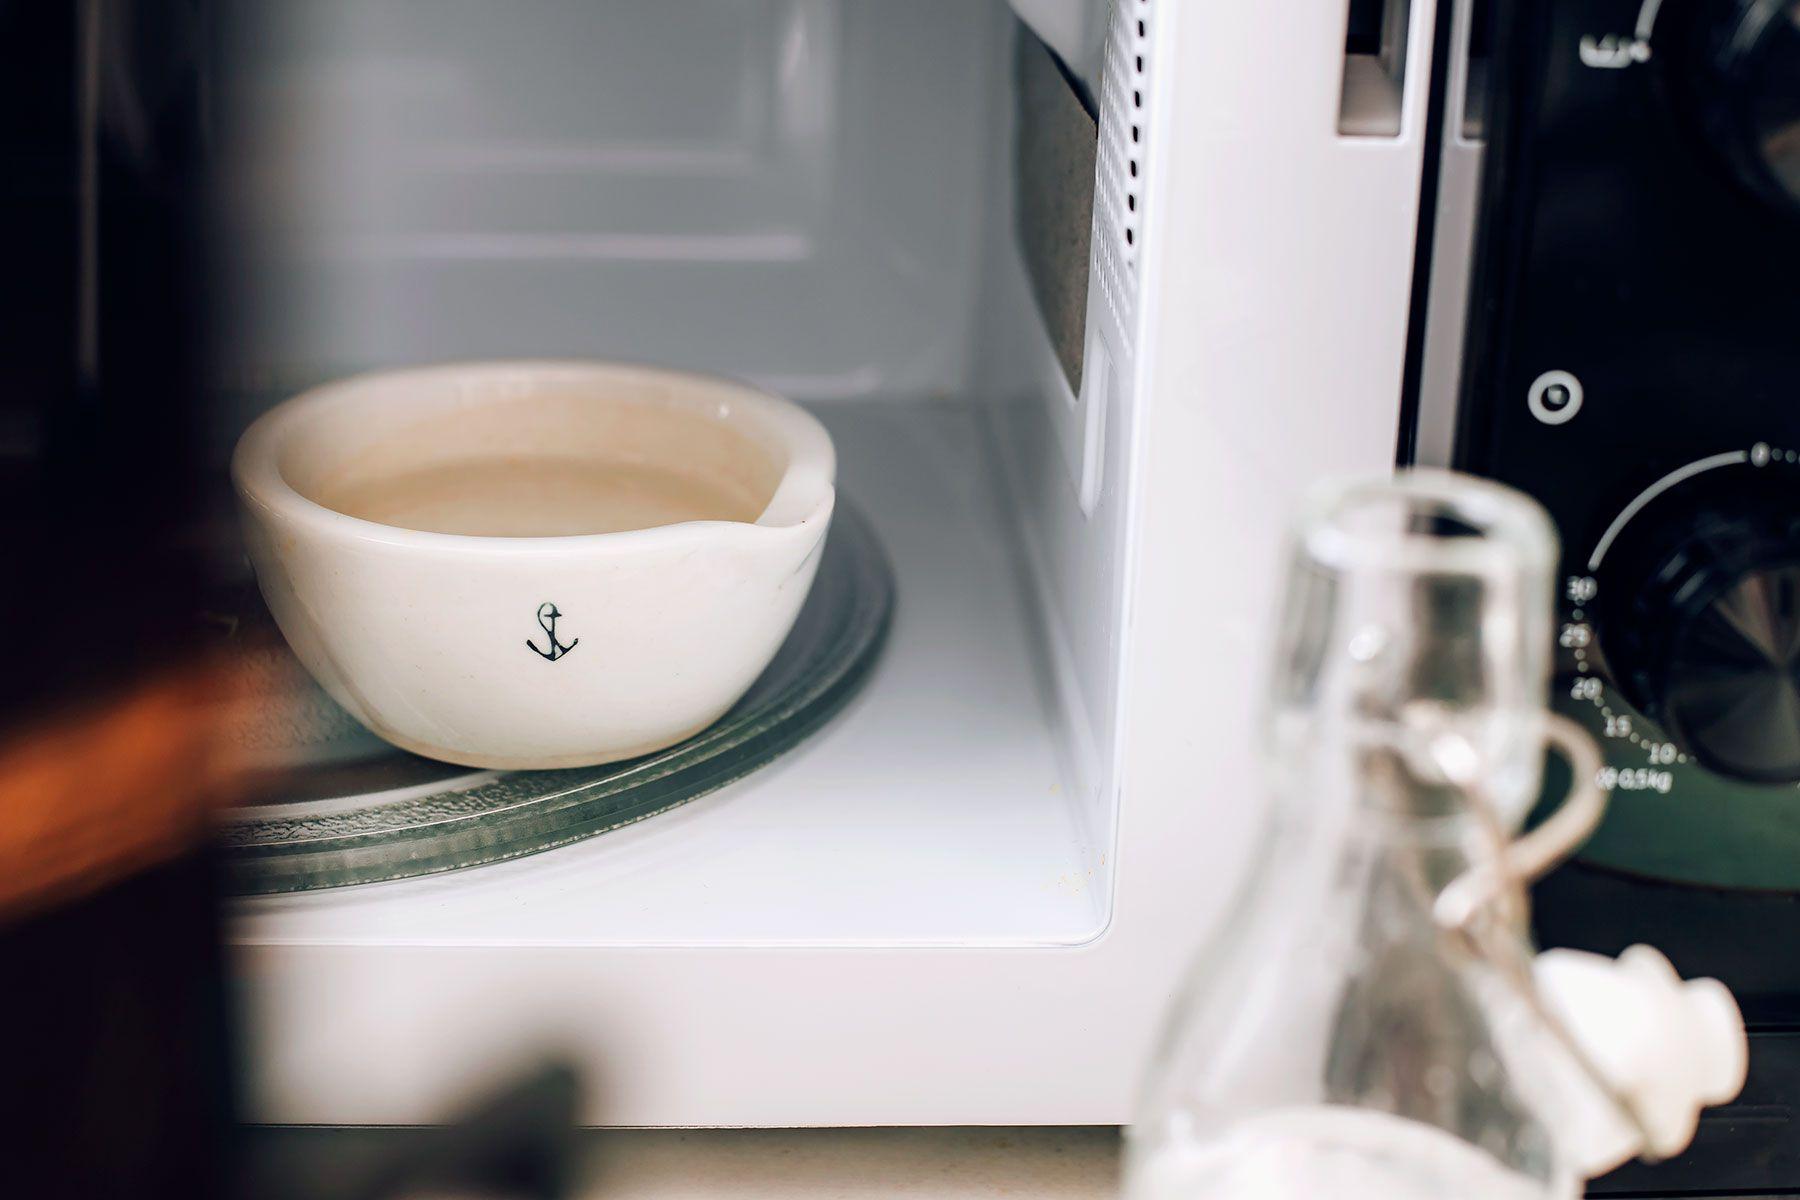 Distilled white vinegar in bowl being heated in microwave